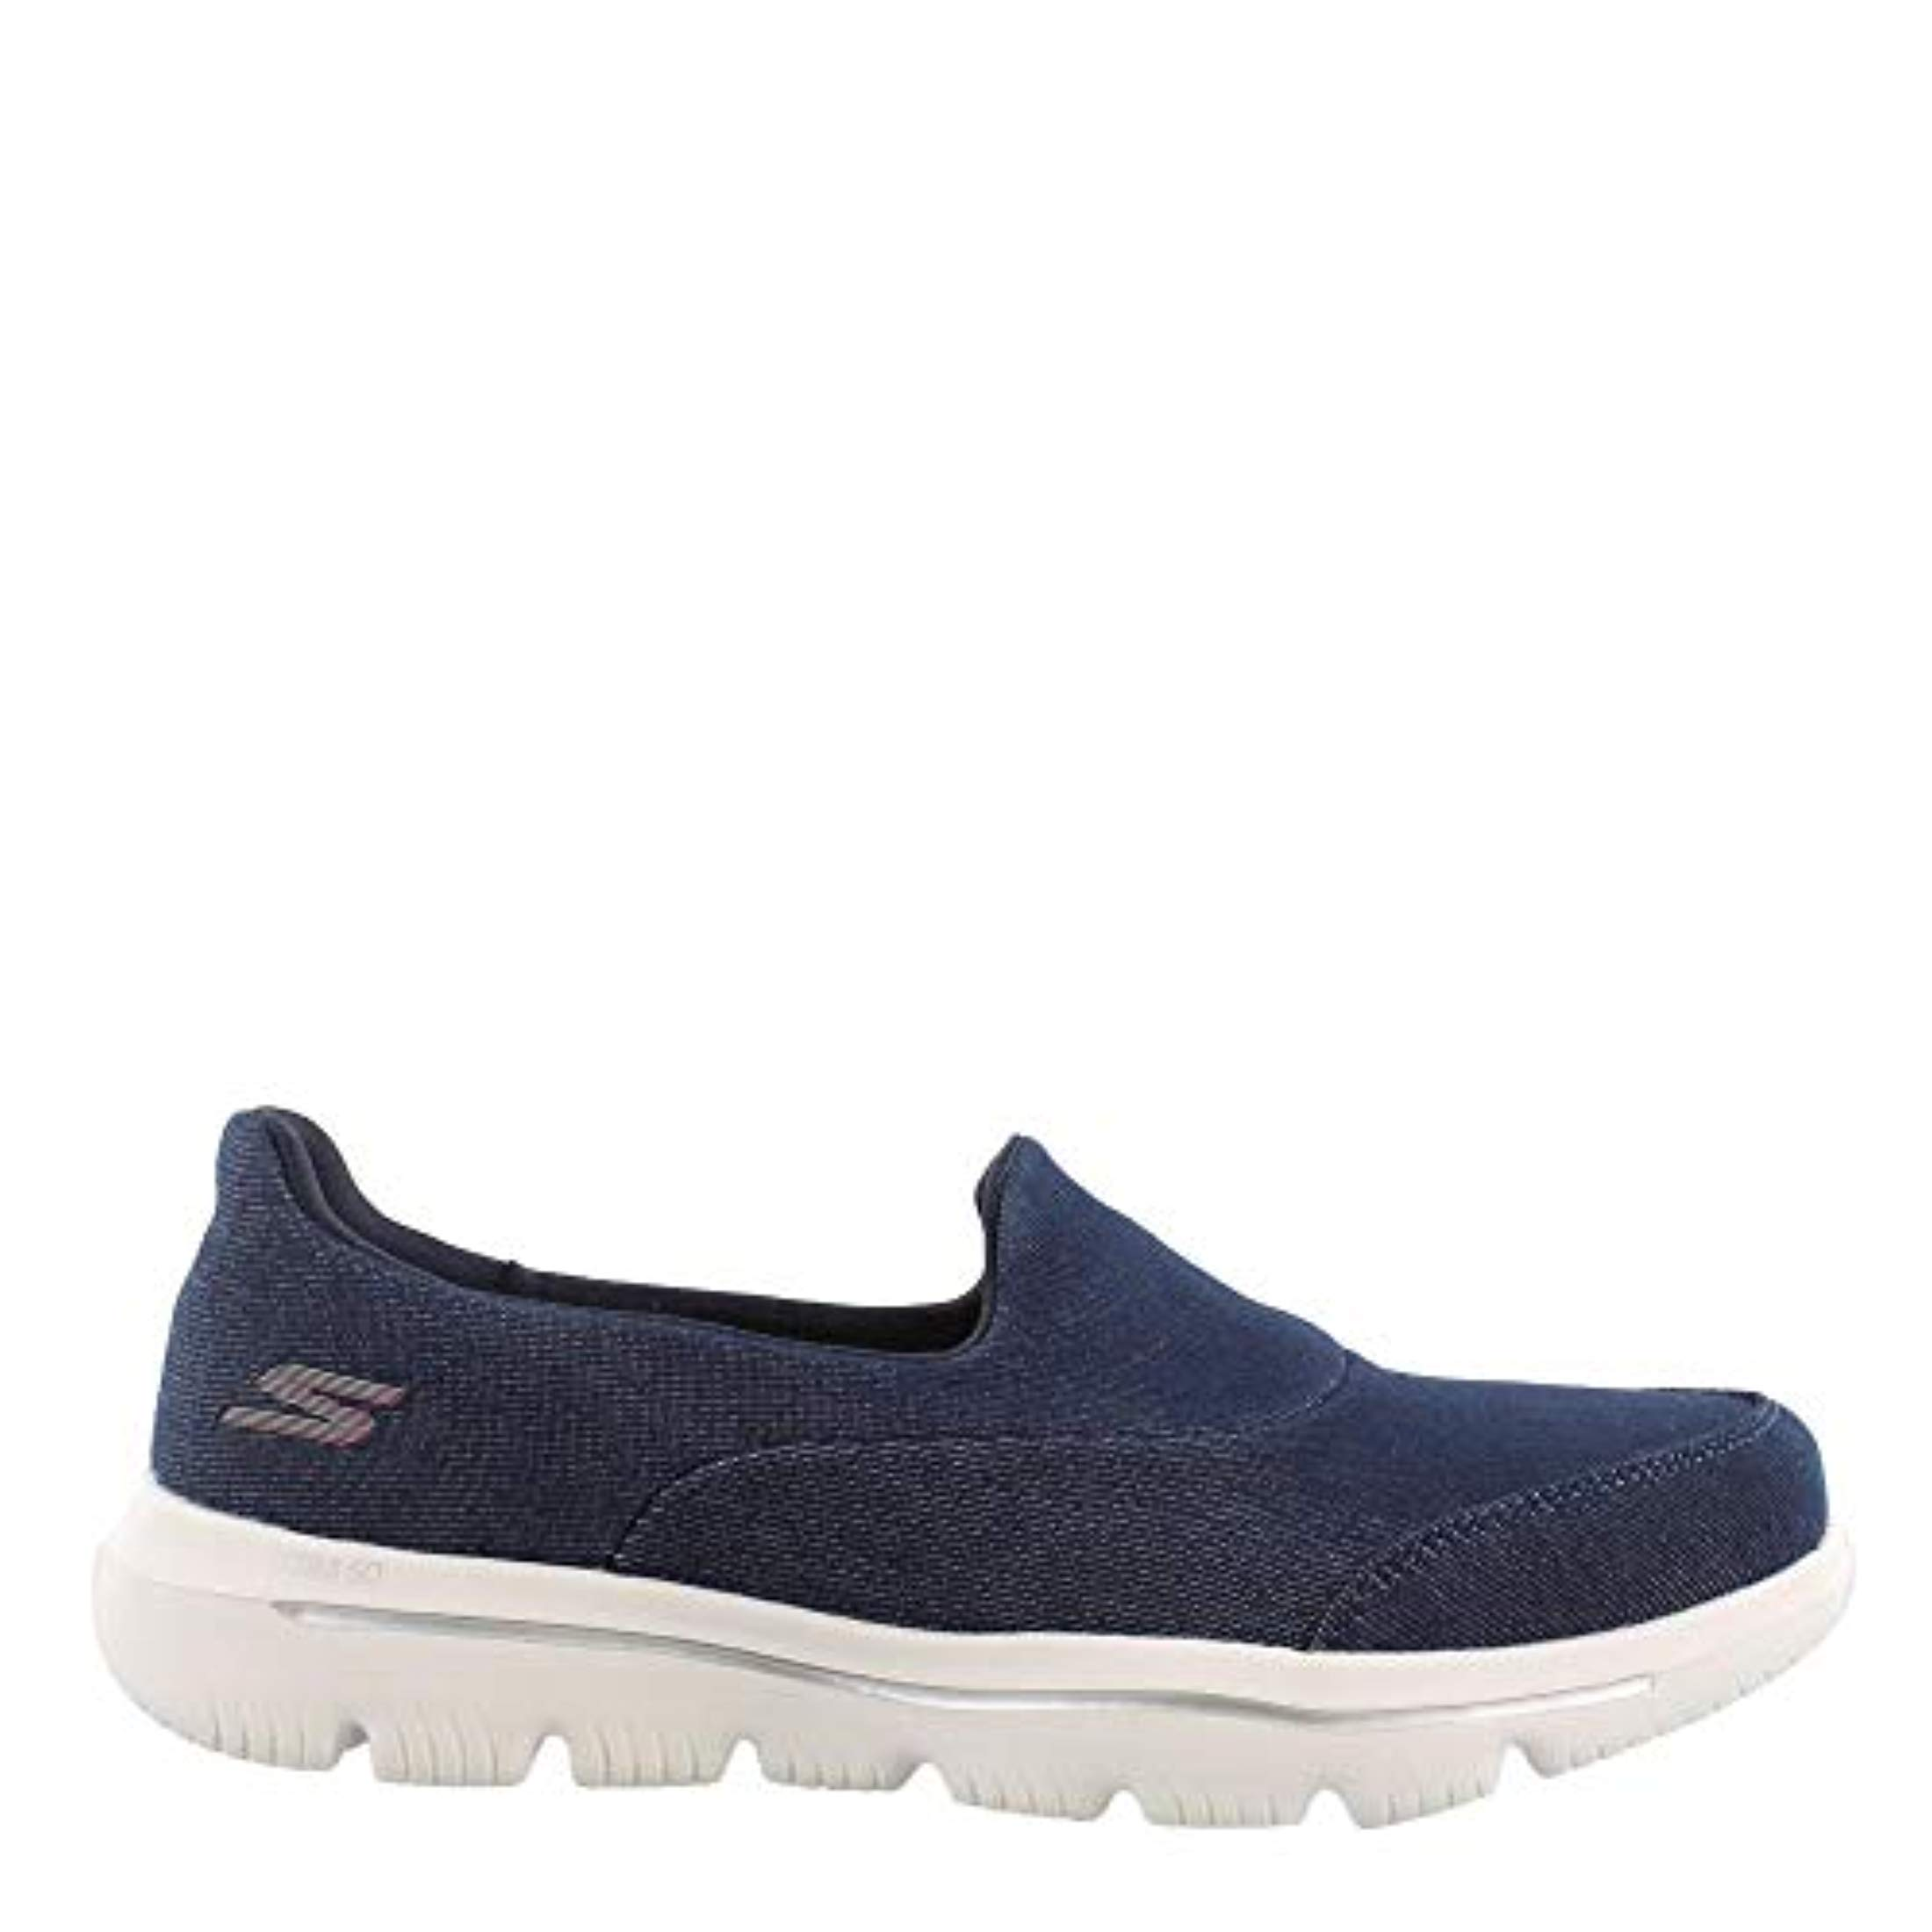 e2e7a580f392 Skechers Women S Go Walk Evolution Ultra-15739 Sneaker